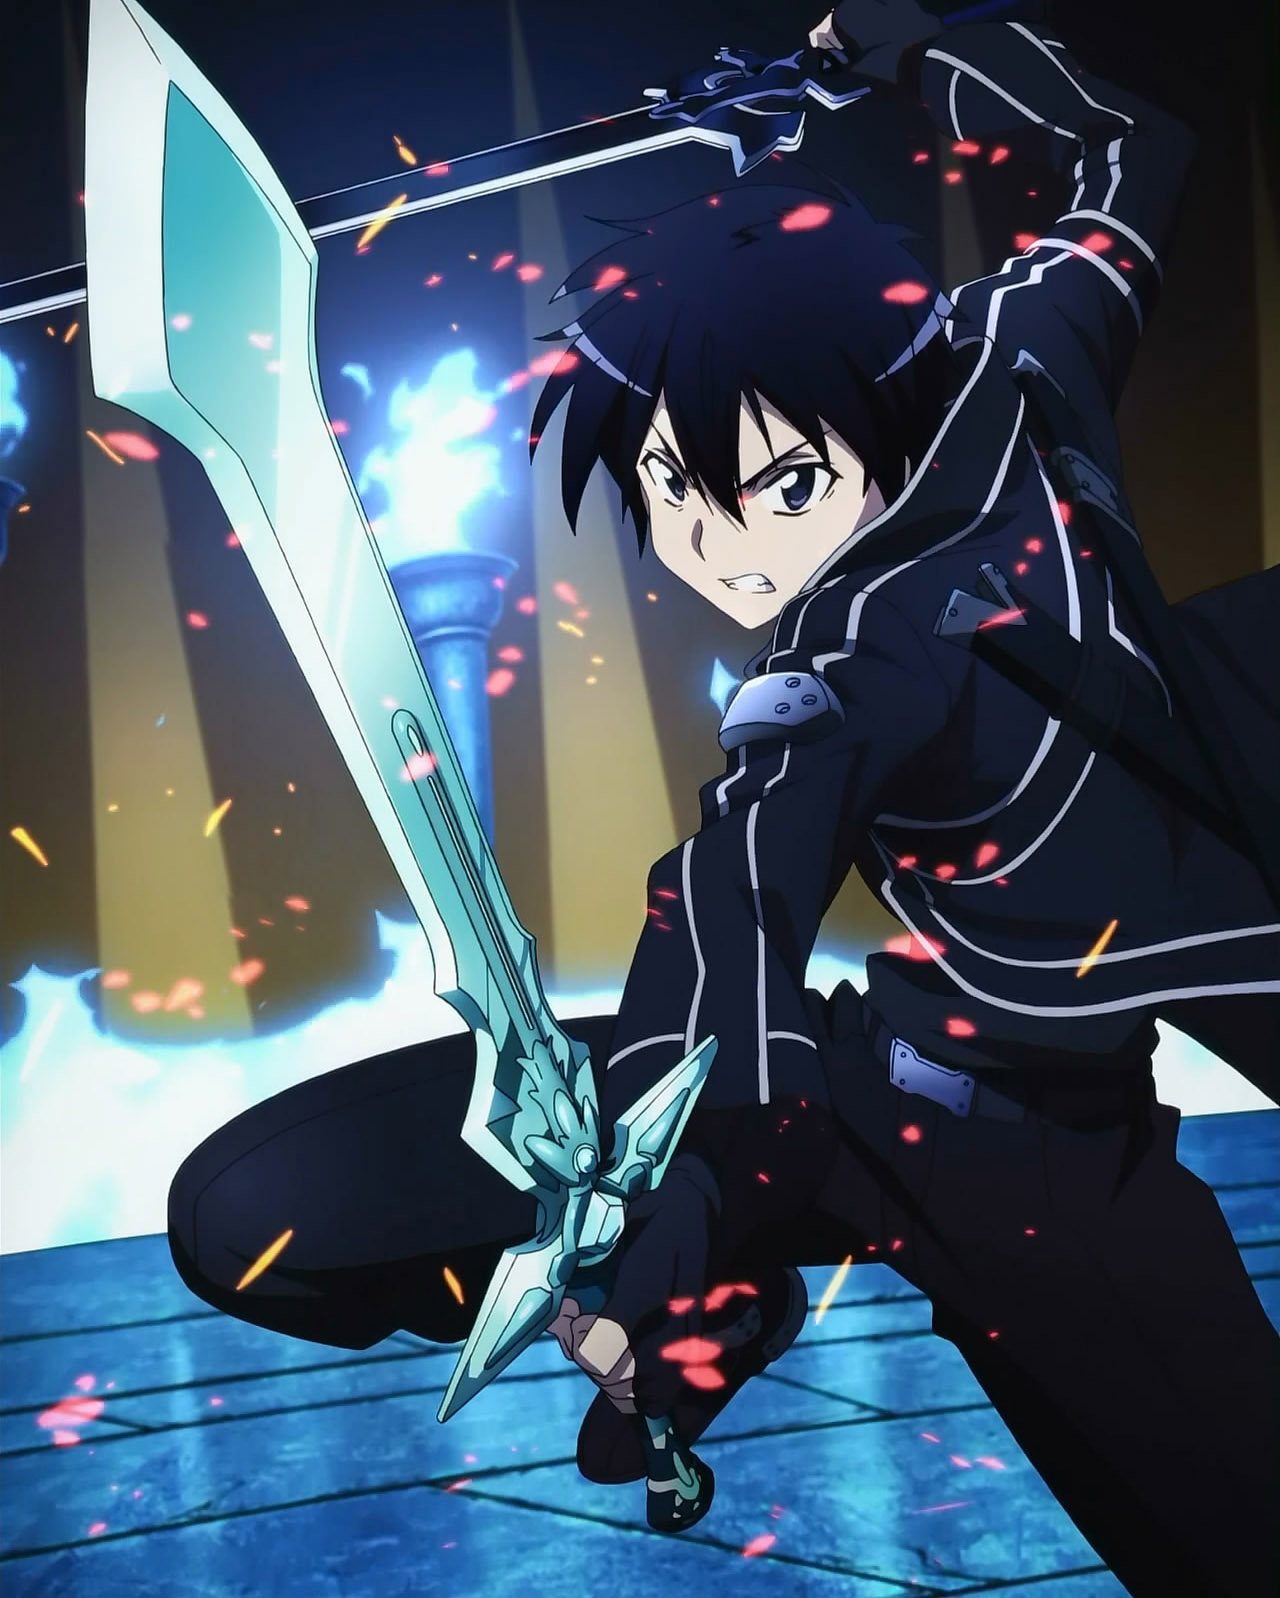 Kirito Dual Blades SAO Hd Wallpaper   HD Backgrounds 1280x1598